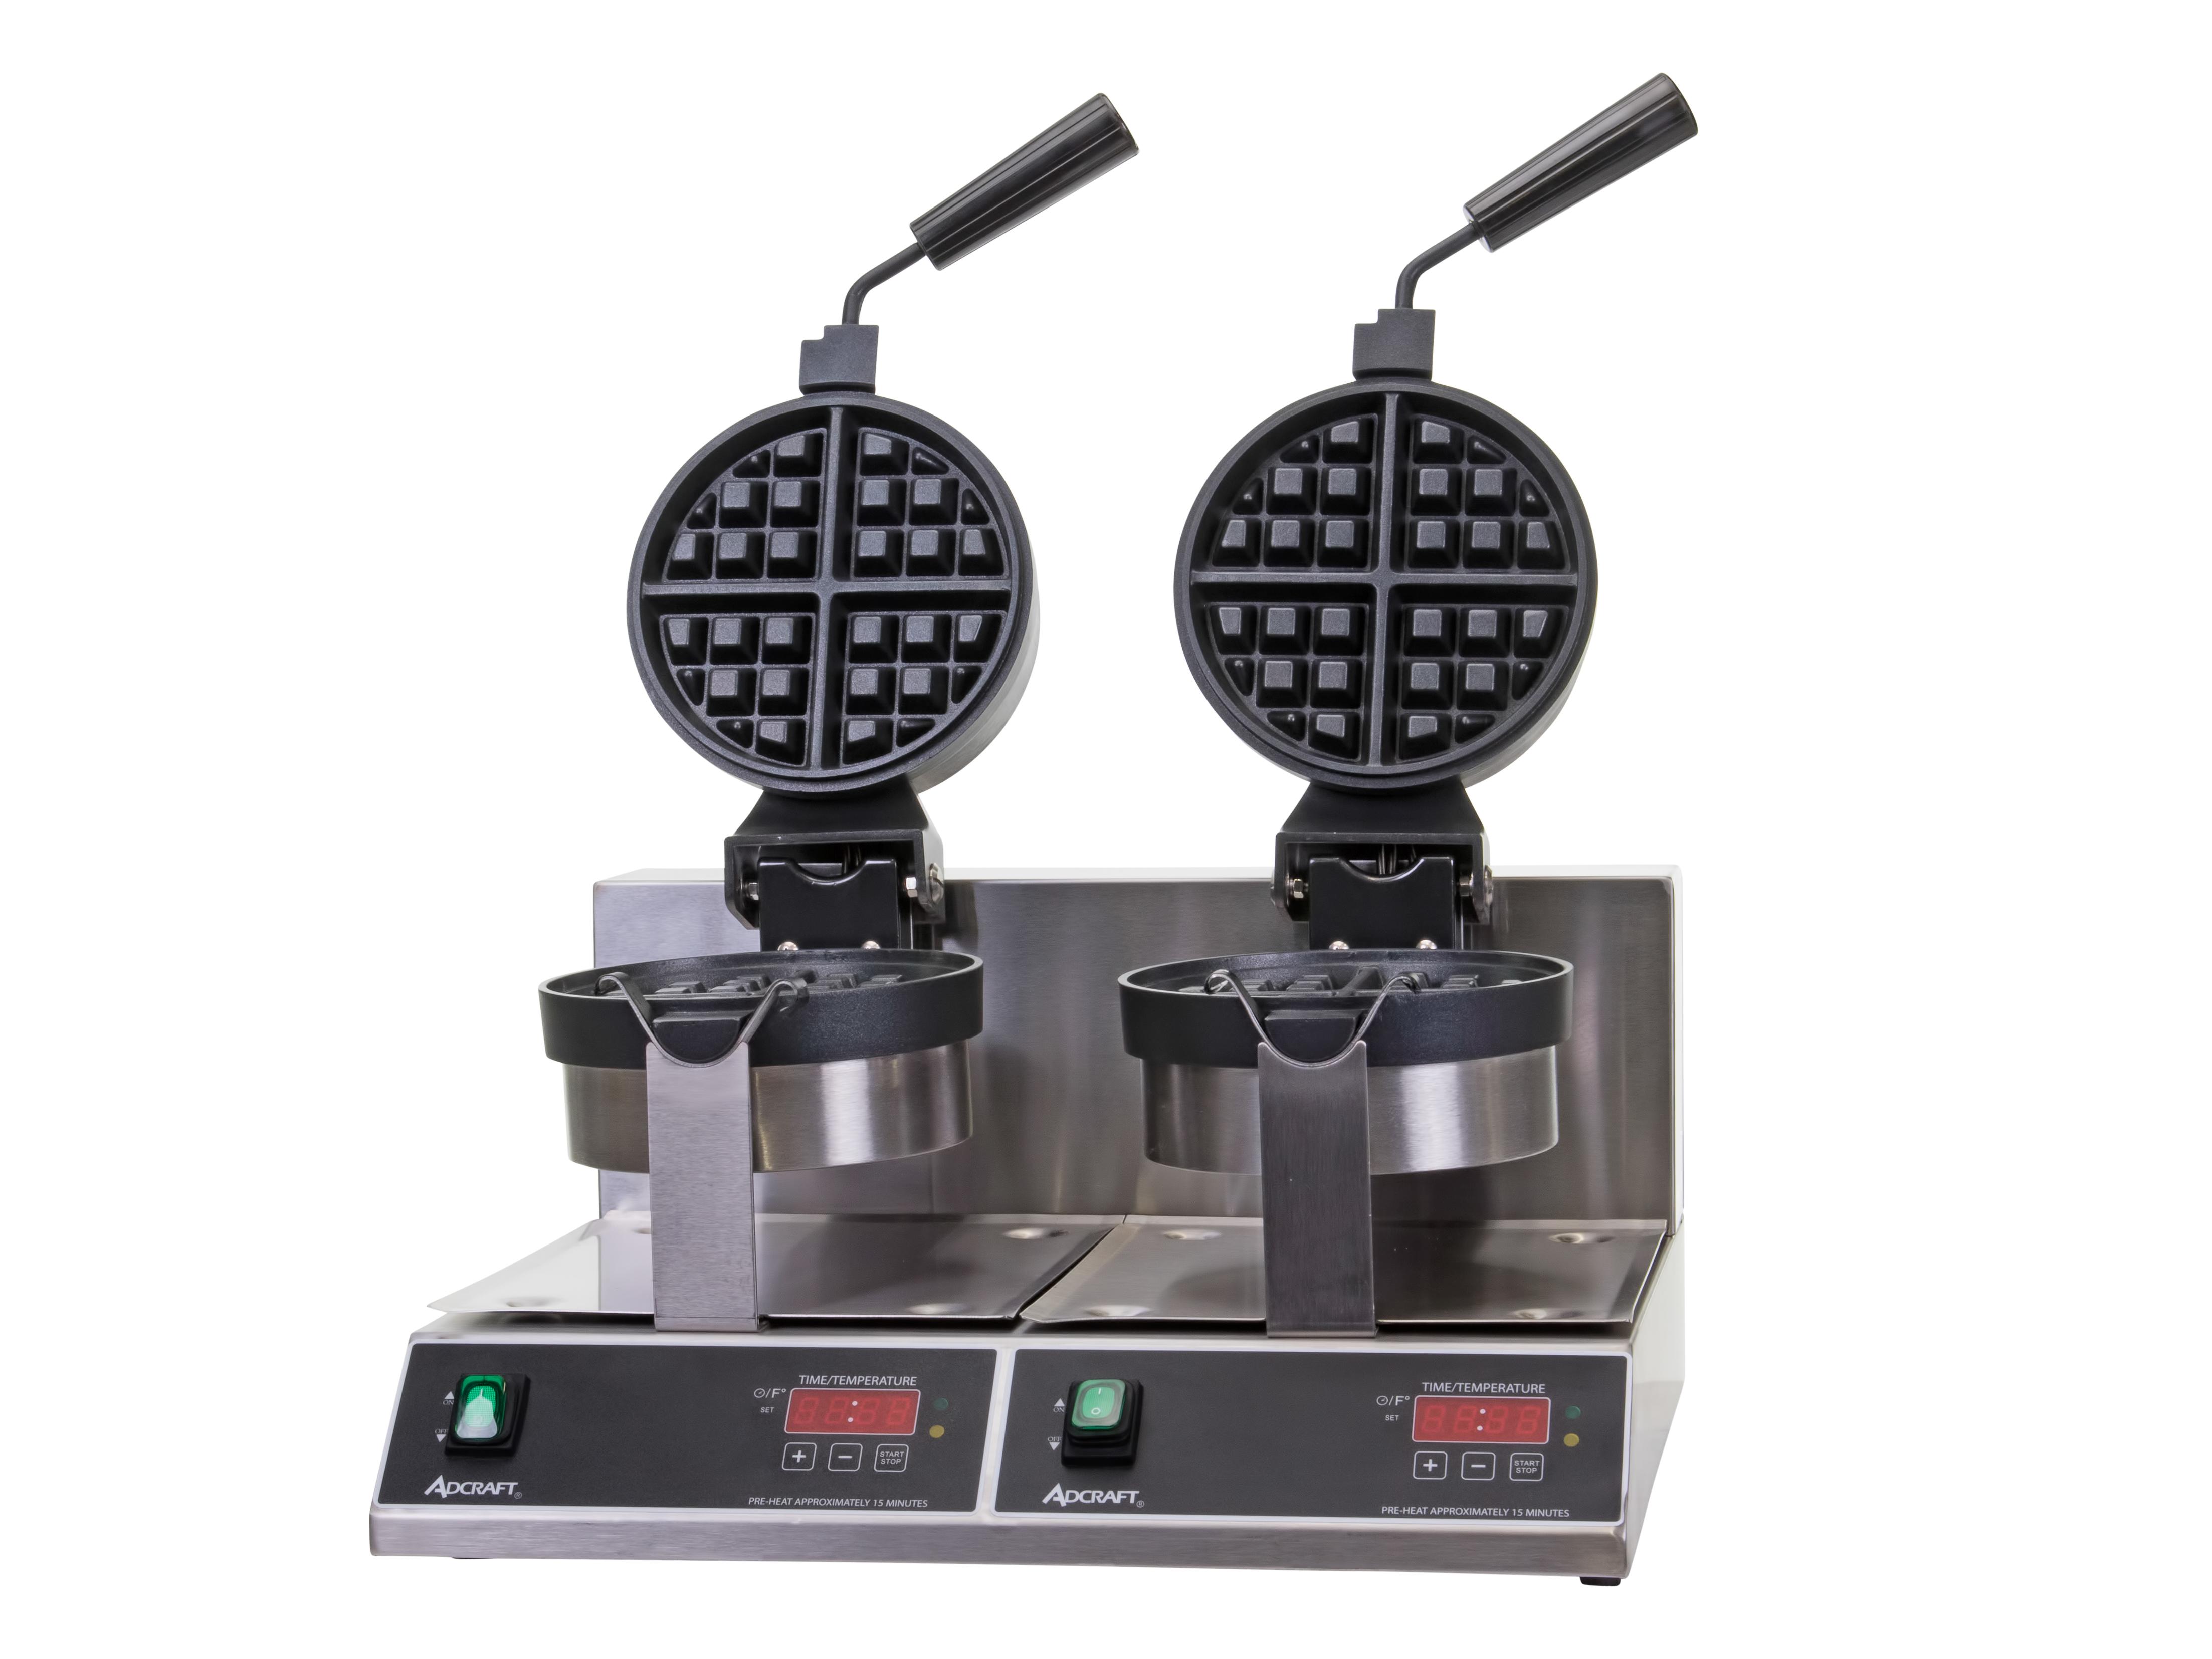 Admiral Craft BWM-7/R-2 belgian waffle maker